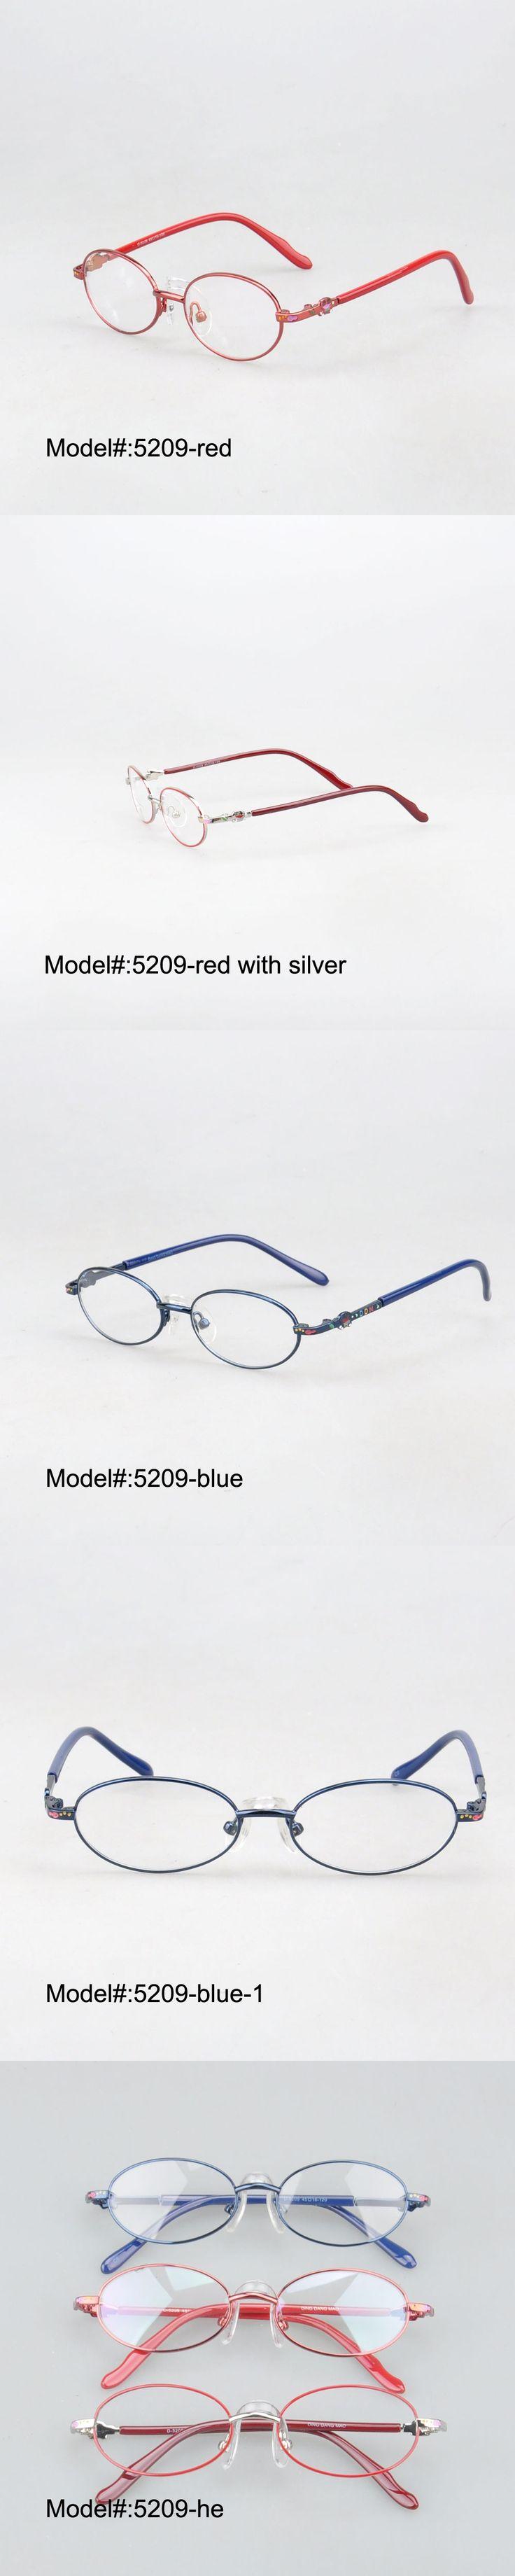 MY DOLI 5209 Children's kids full rim metal with spring hinge prescription glasses optical frame spectacles eyewear eyeglasses